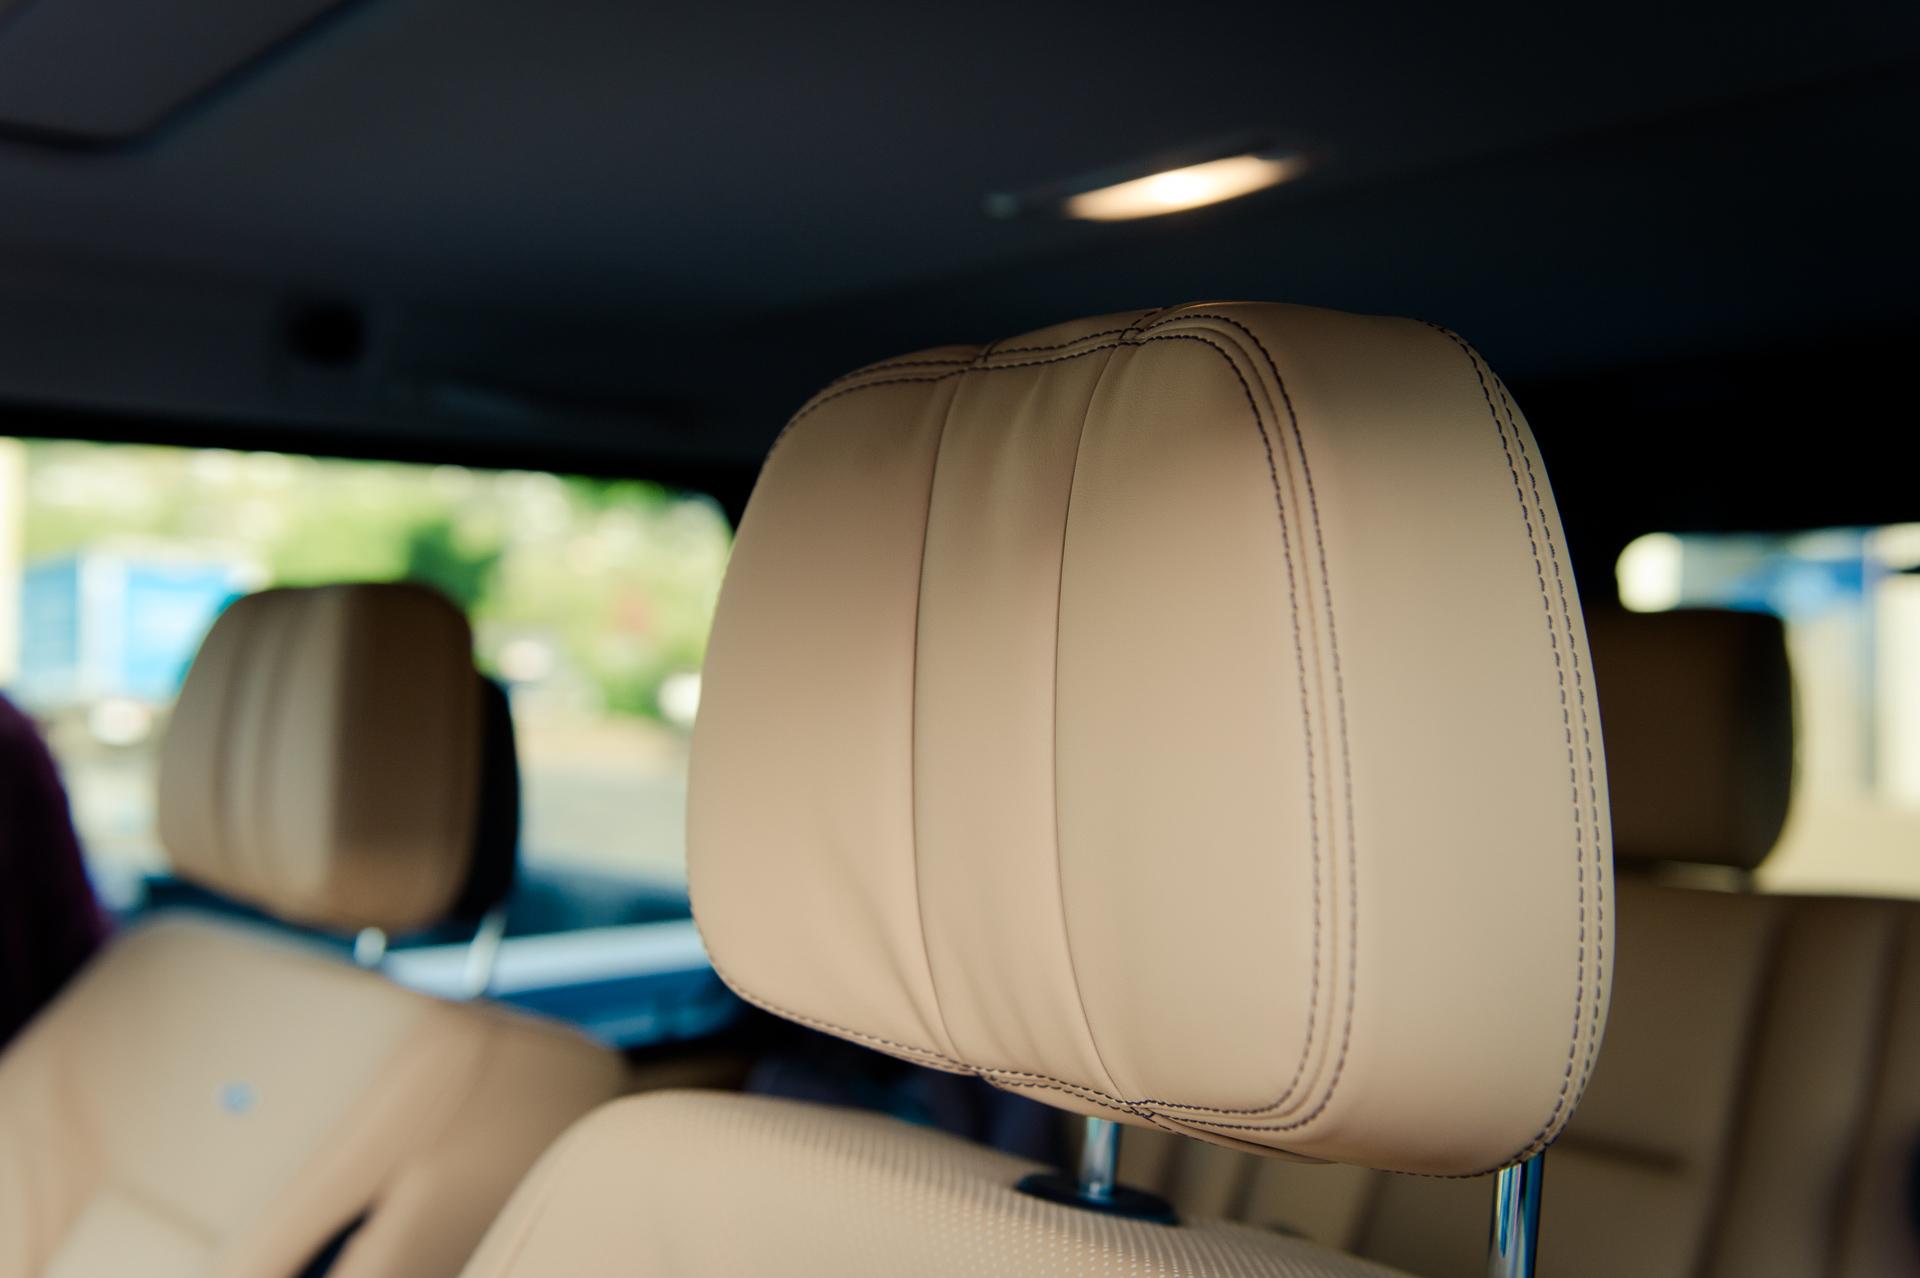 2014-Mercedes-Benz-G500-G550-braun-Kalifornien-mbrt14-41